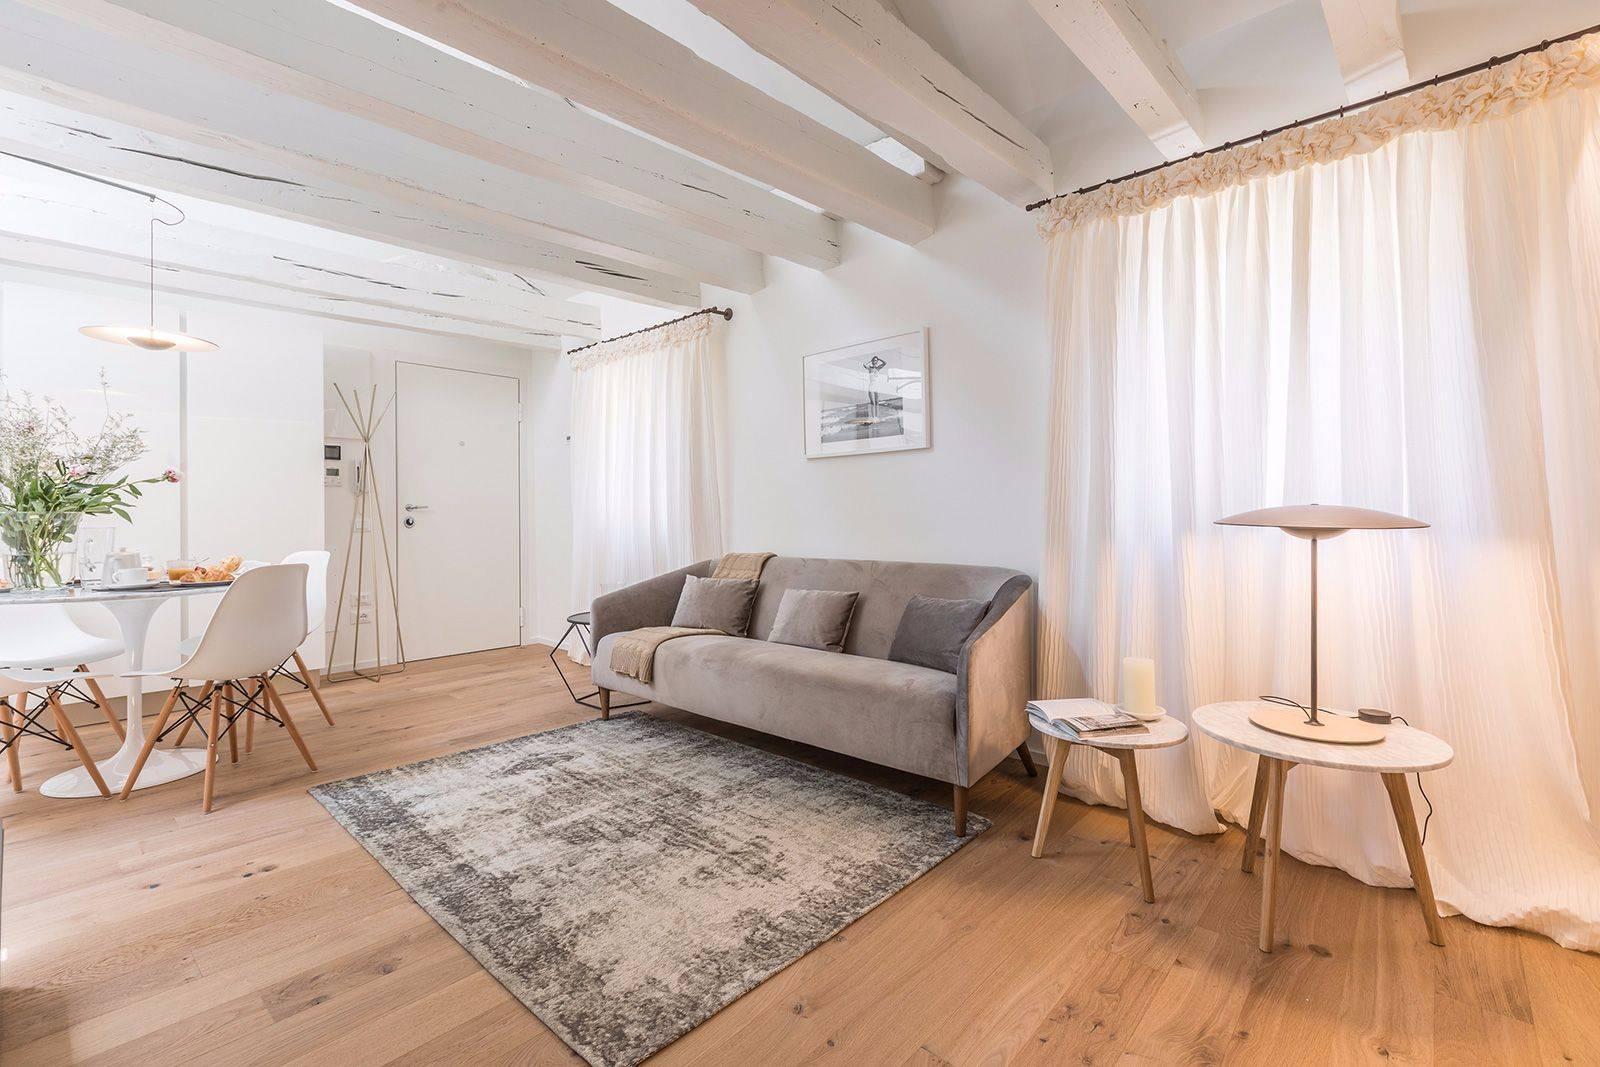 nice parquet flooring, wooden beams, designer furniture